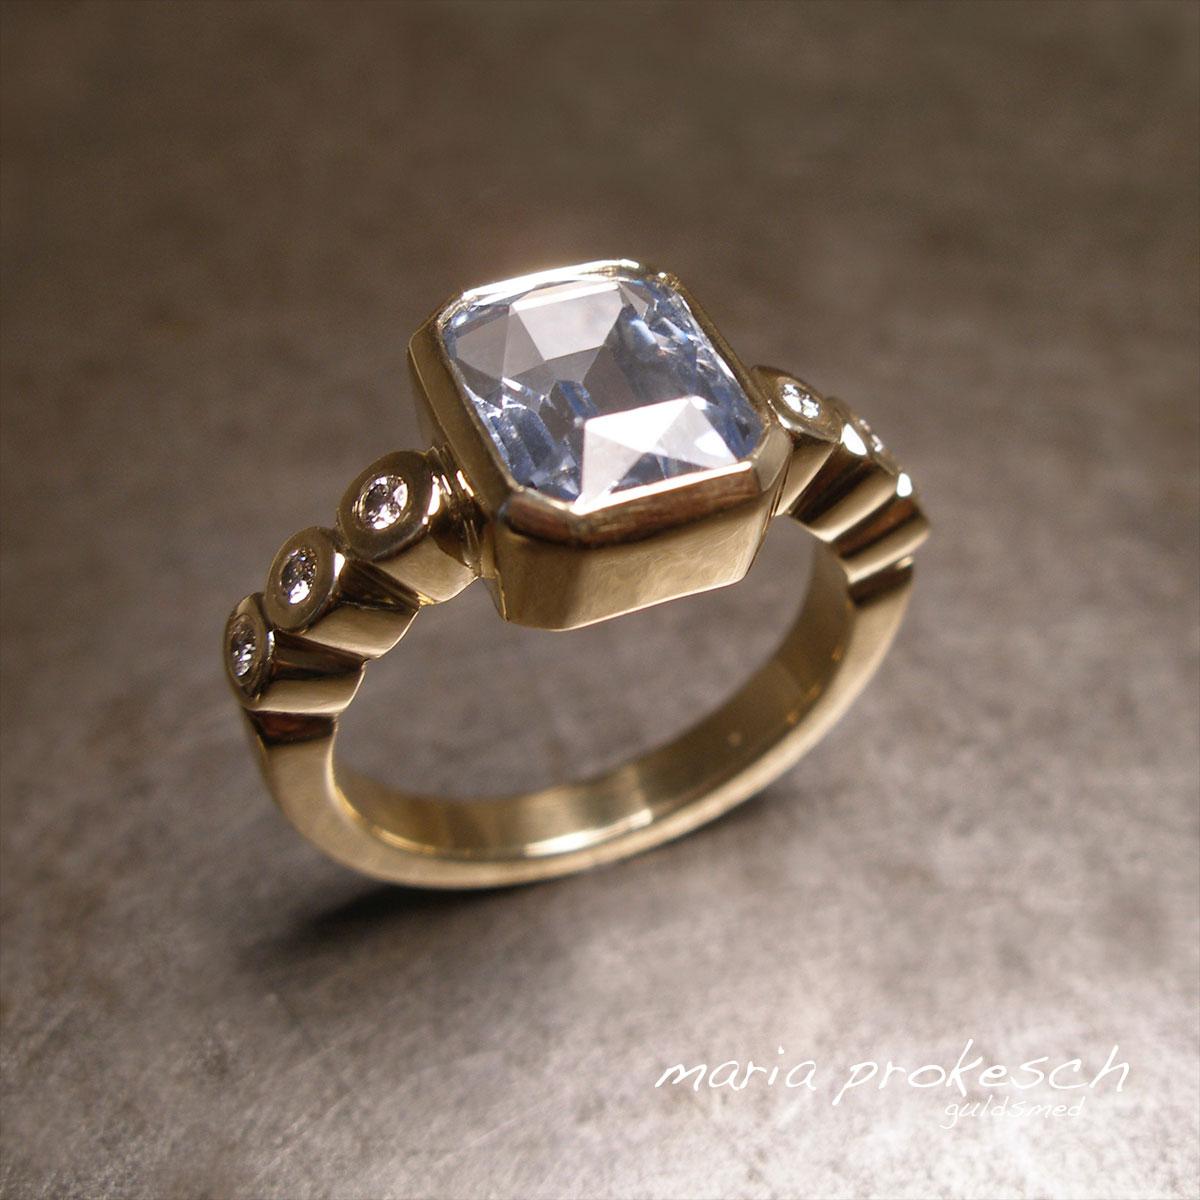 Guldring med topas i klassisk elegant design. Diamanter som pynt på siderne, alt håndlavet